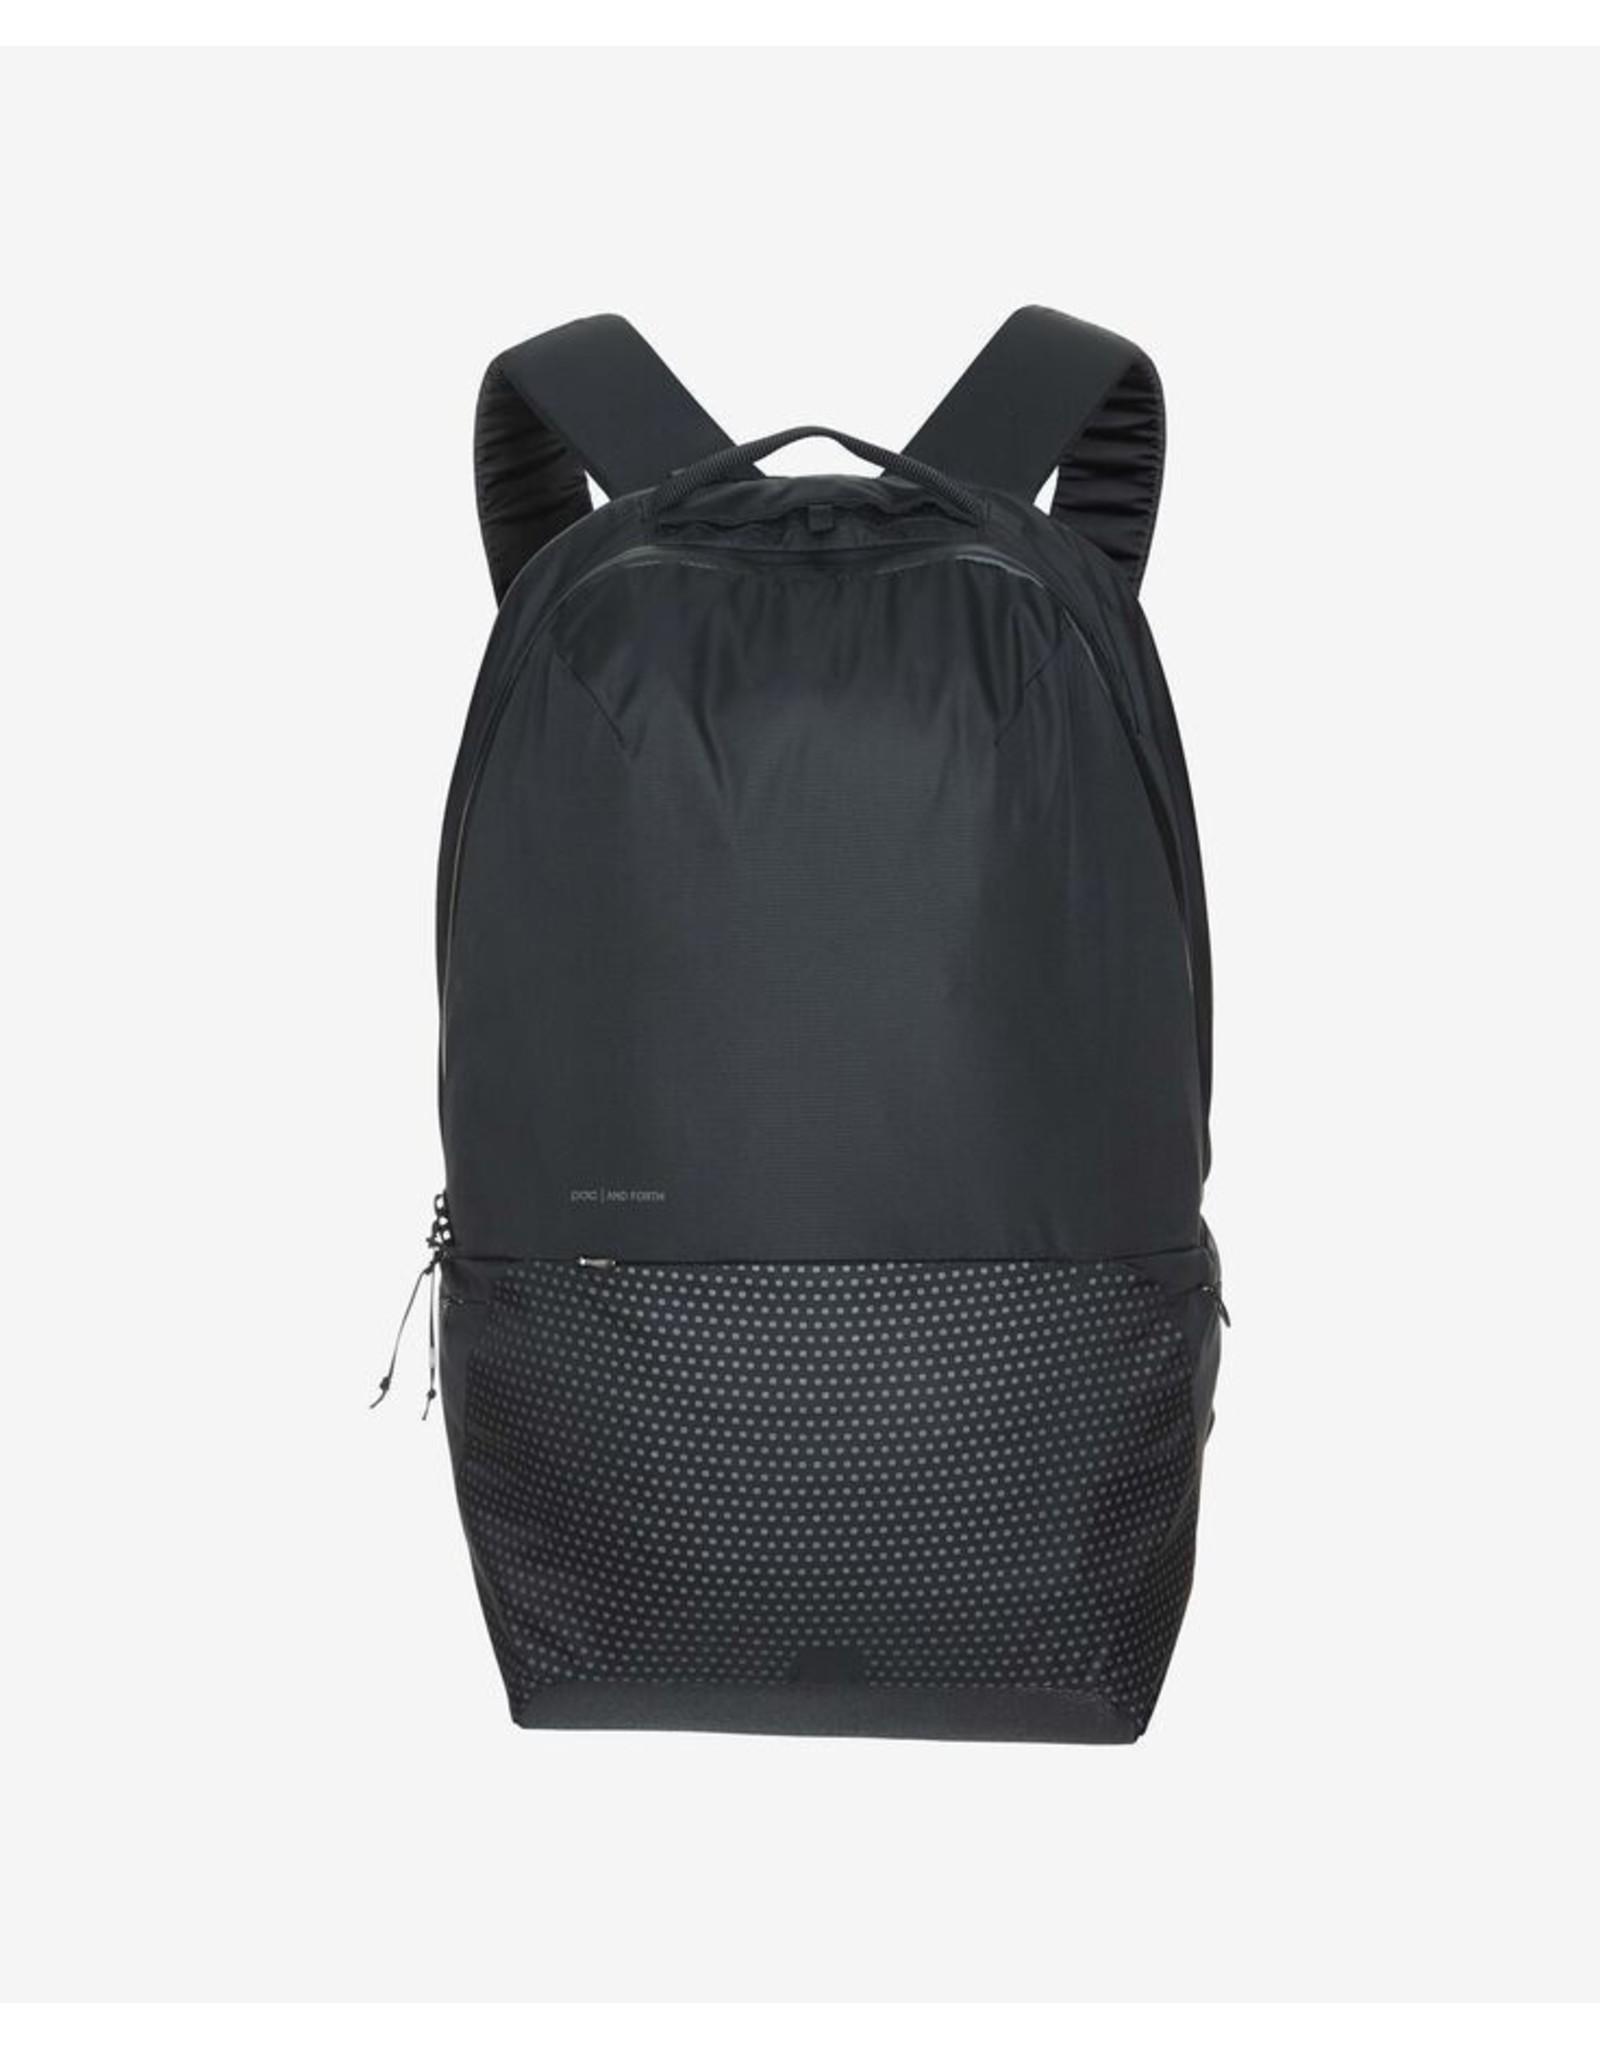 POC POC Berlin Backpack